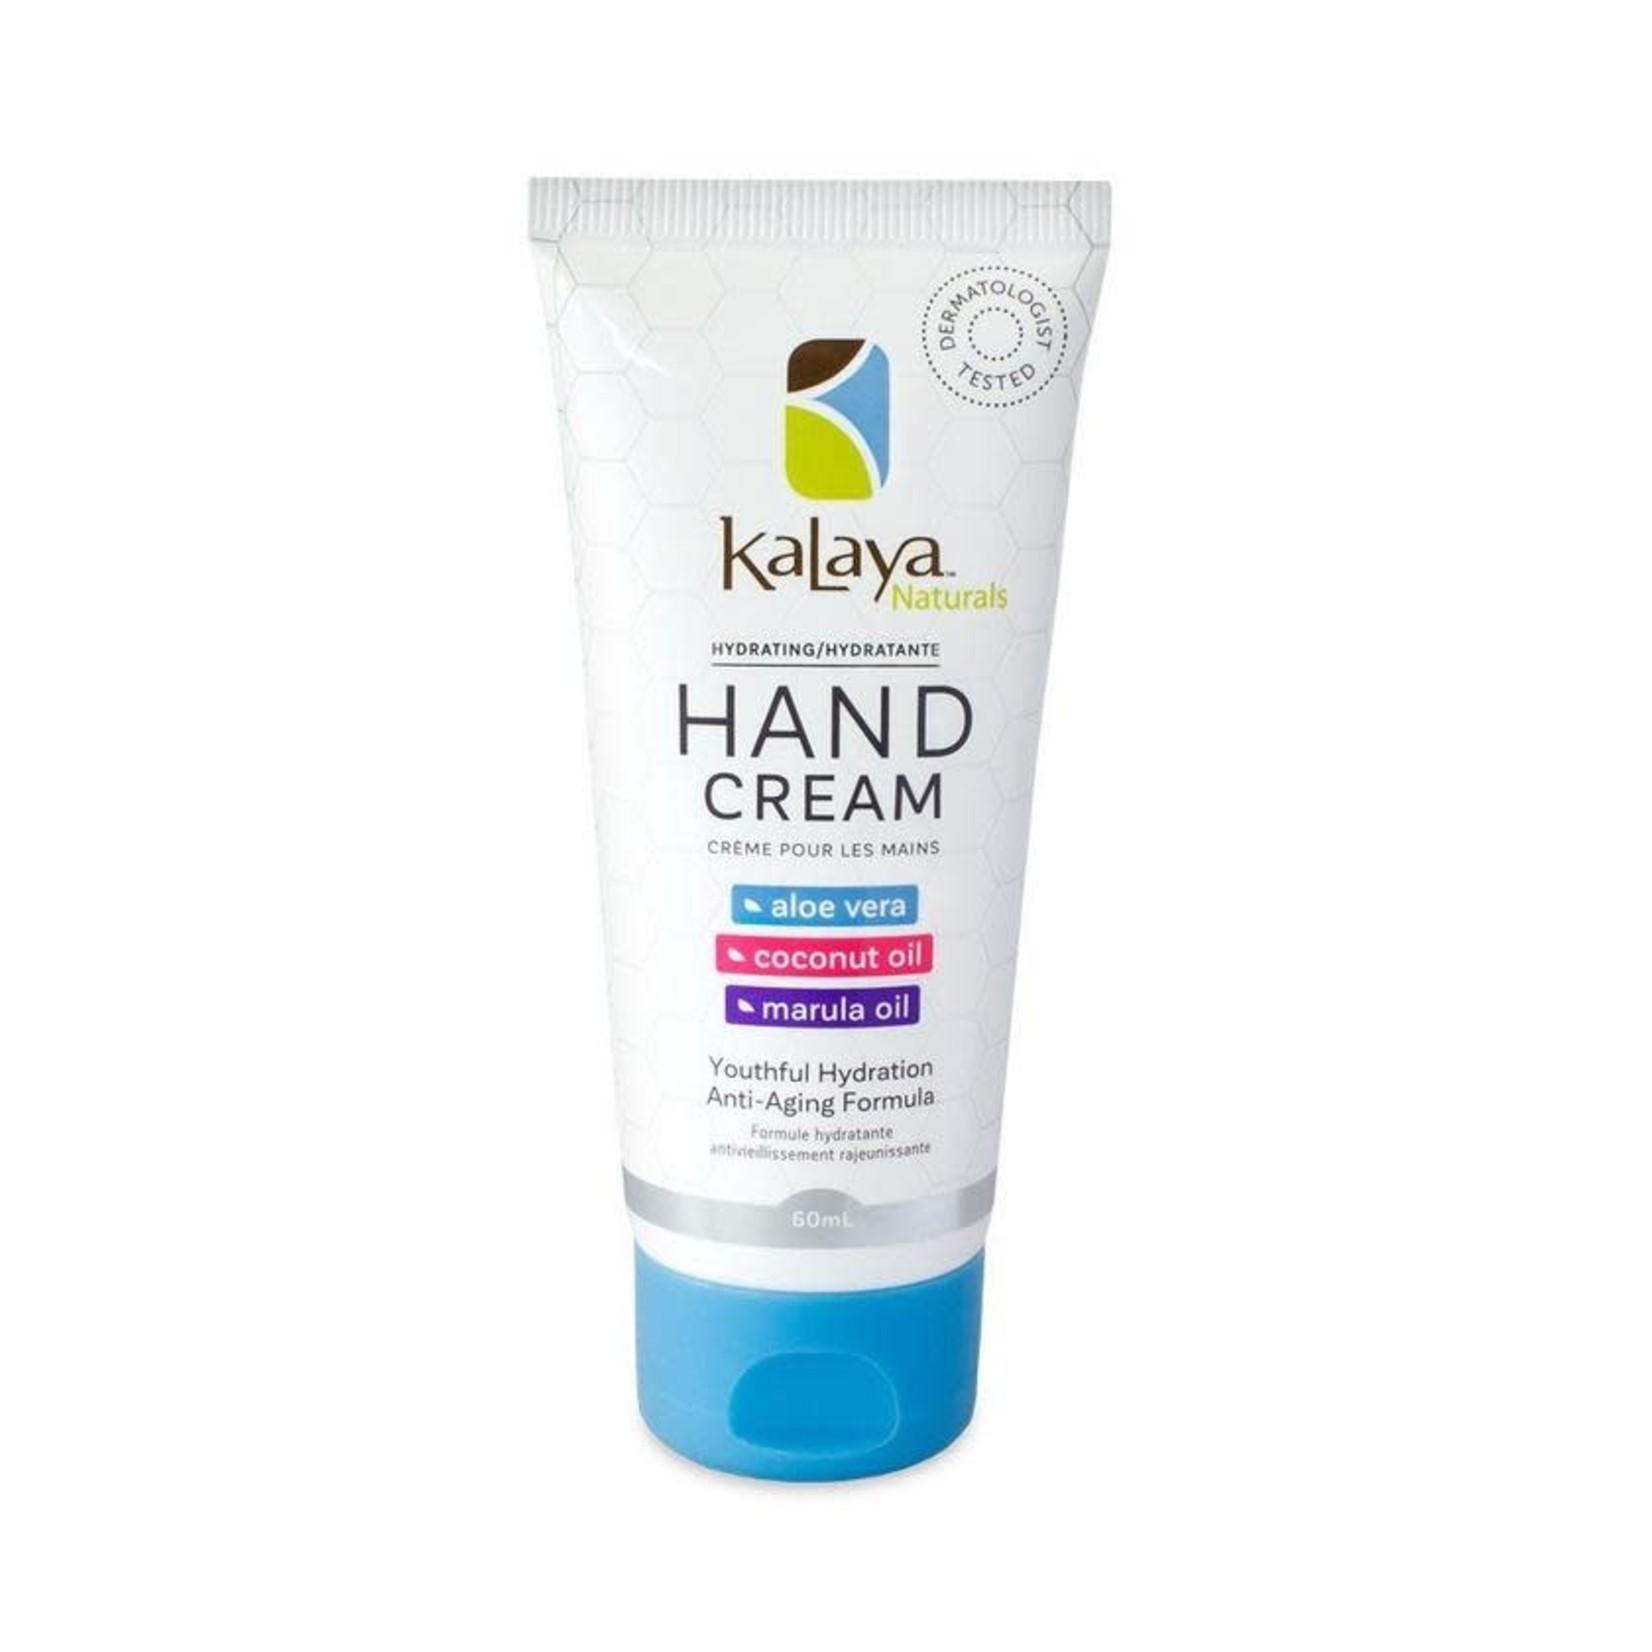 Kalaya Kalaya Hand Cream 60ml